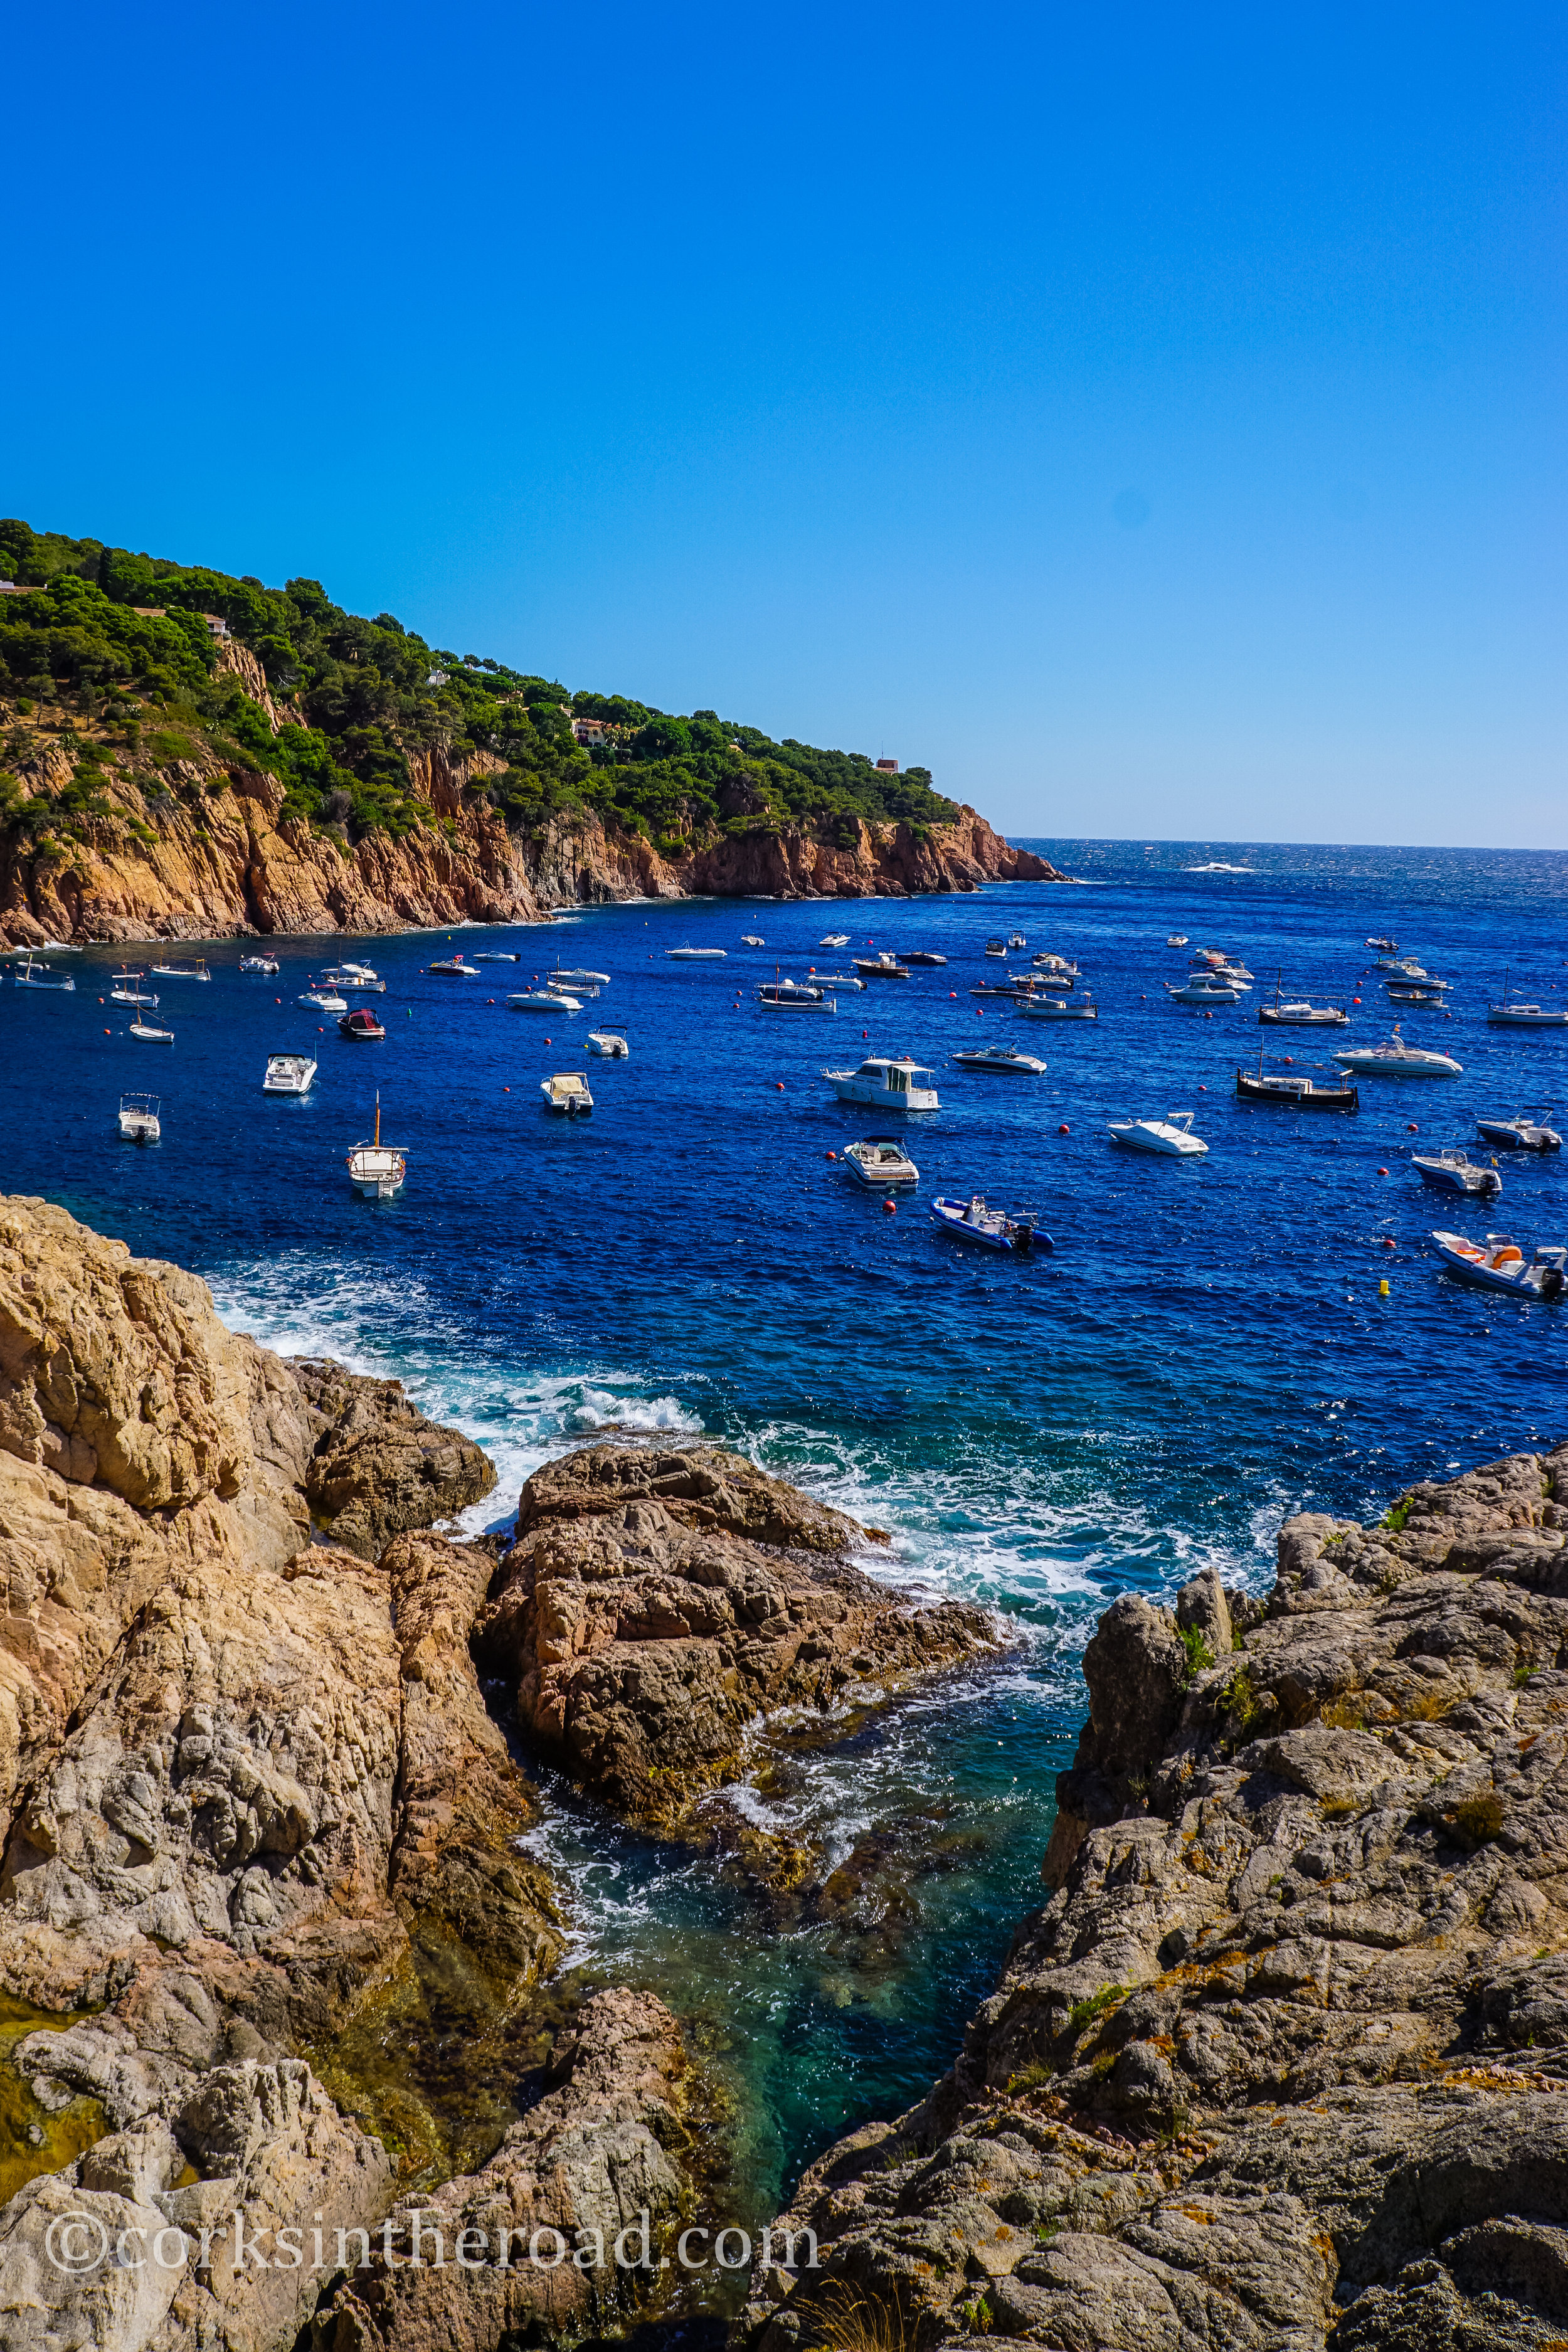 20160810Barcelona, Corksintheroad, Costa Brava, Costa Brava Landscape-19.jpg